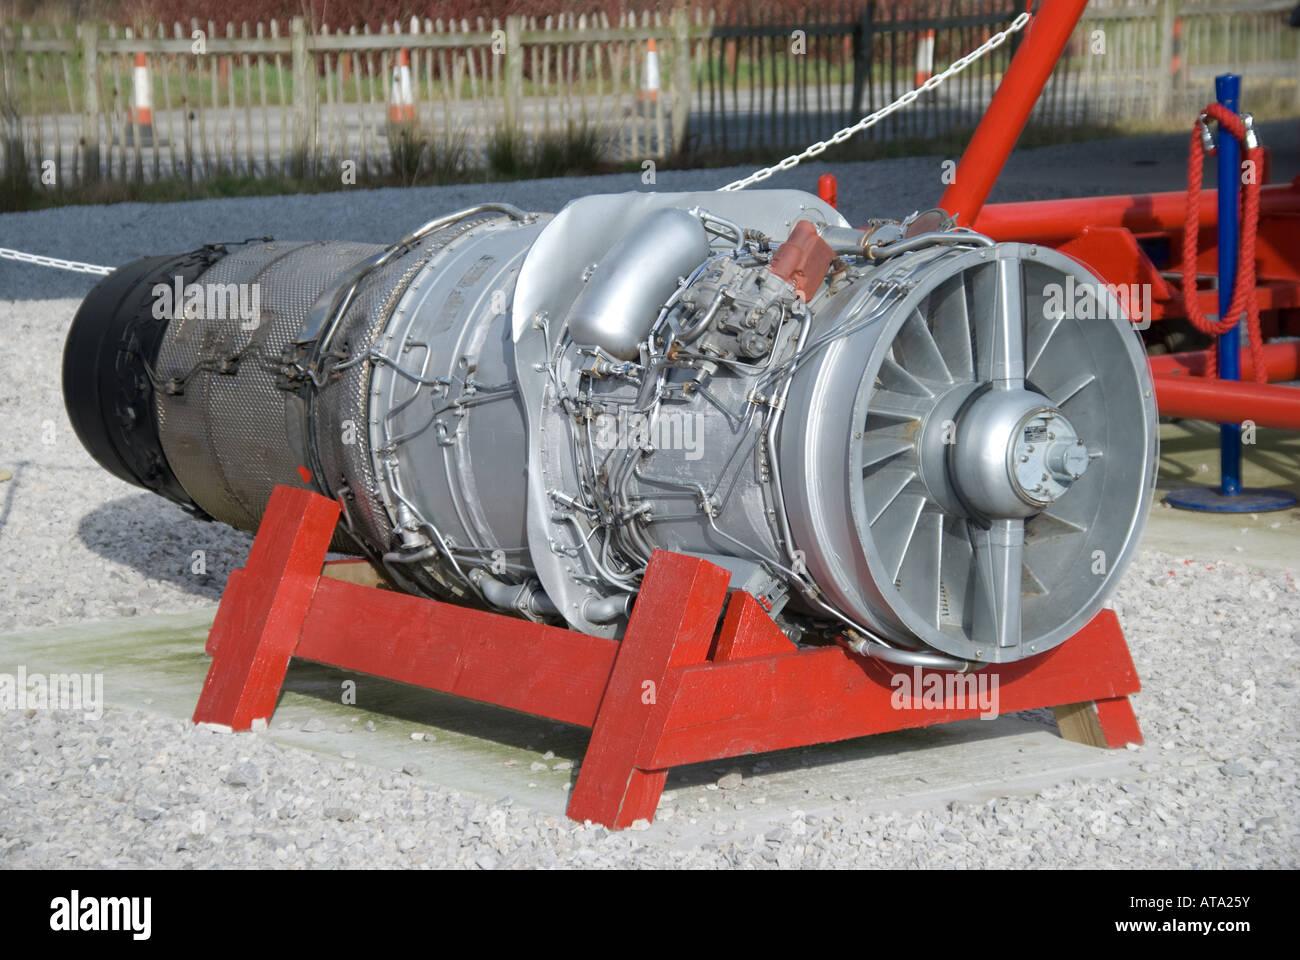 Rolls Royce Spey 505 Jet Engine - Stock Image